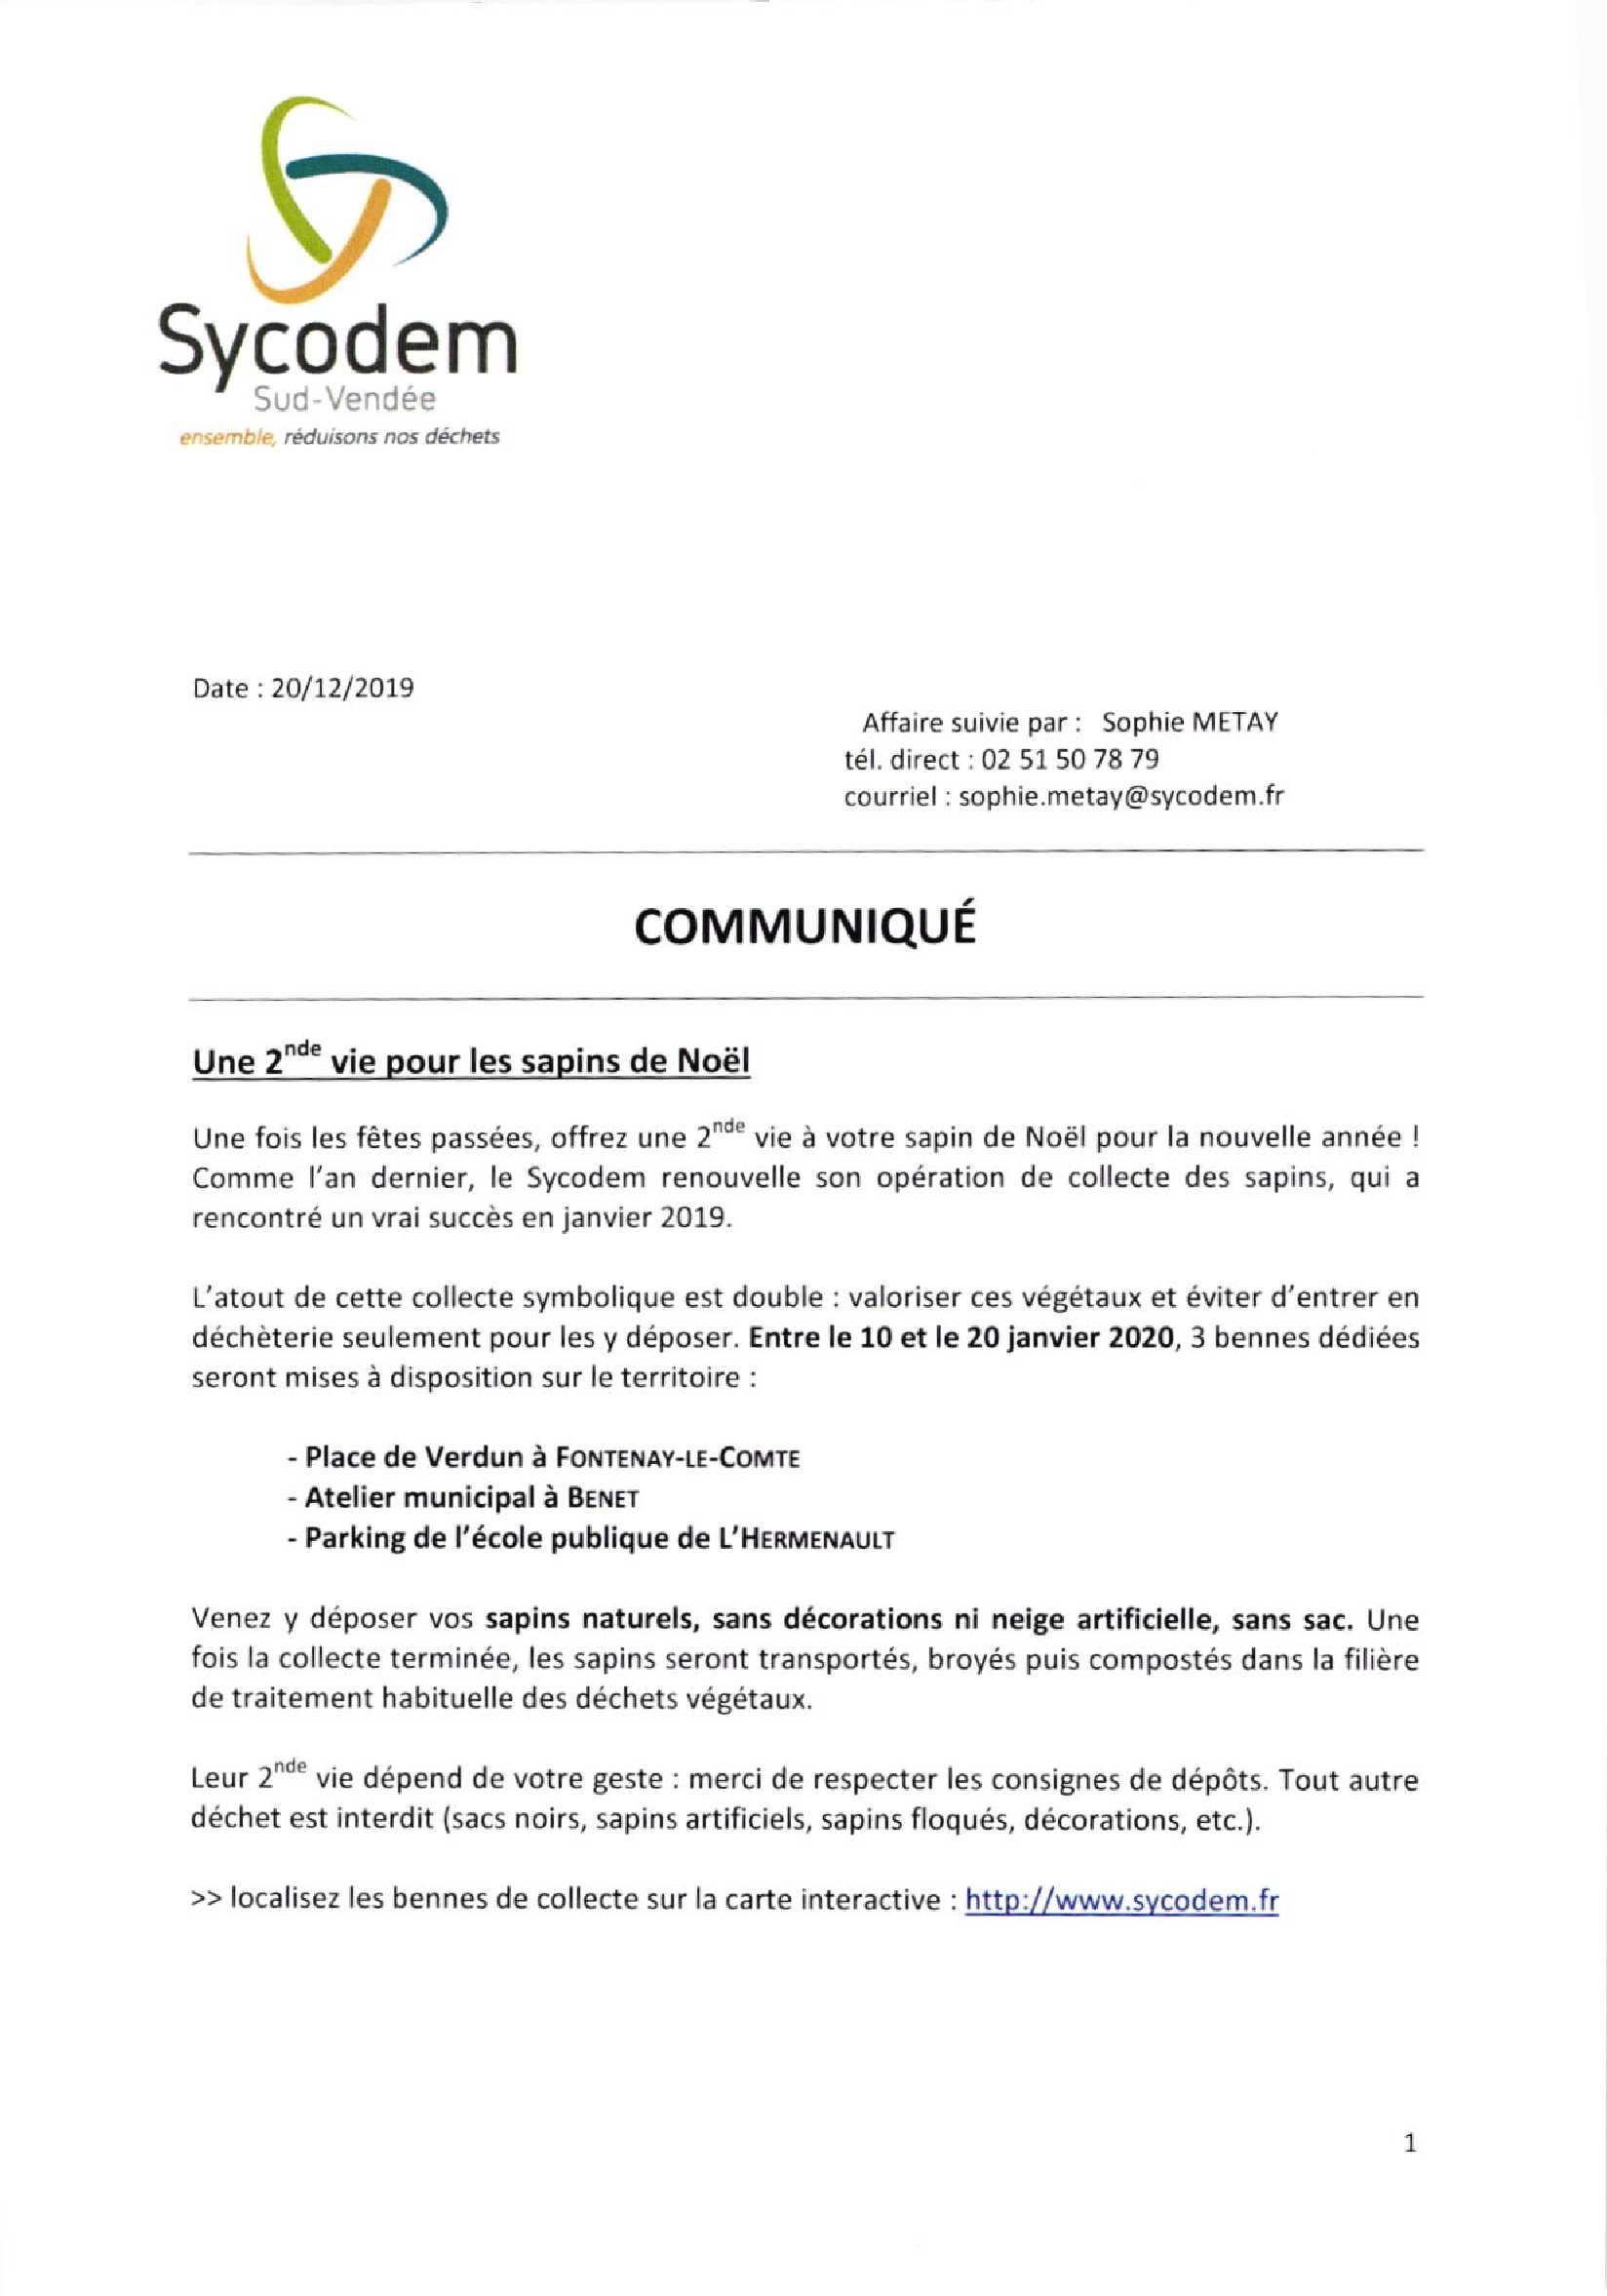 communiqué Sycodem 1